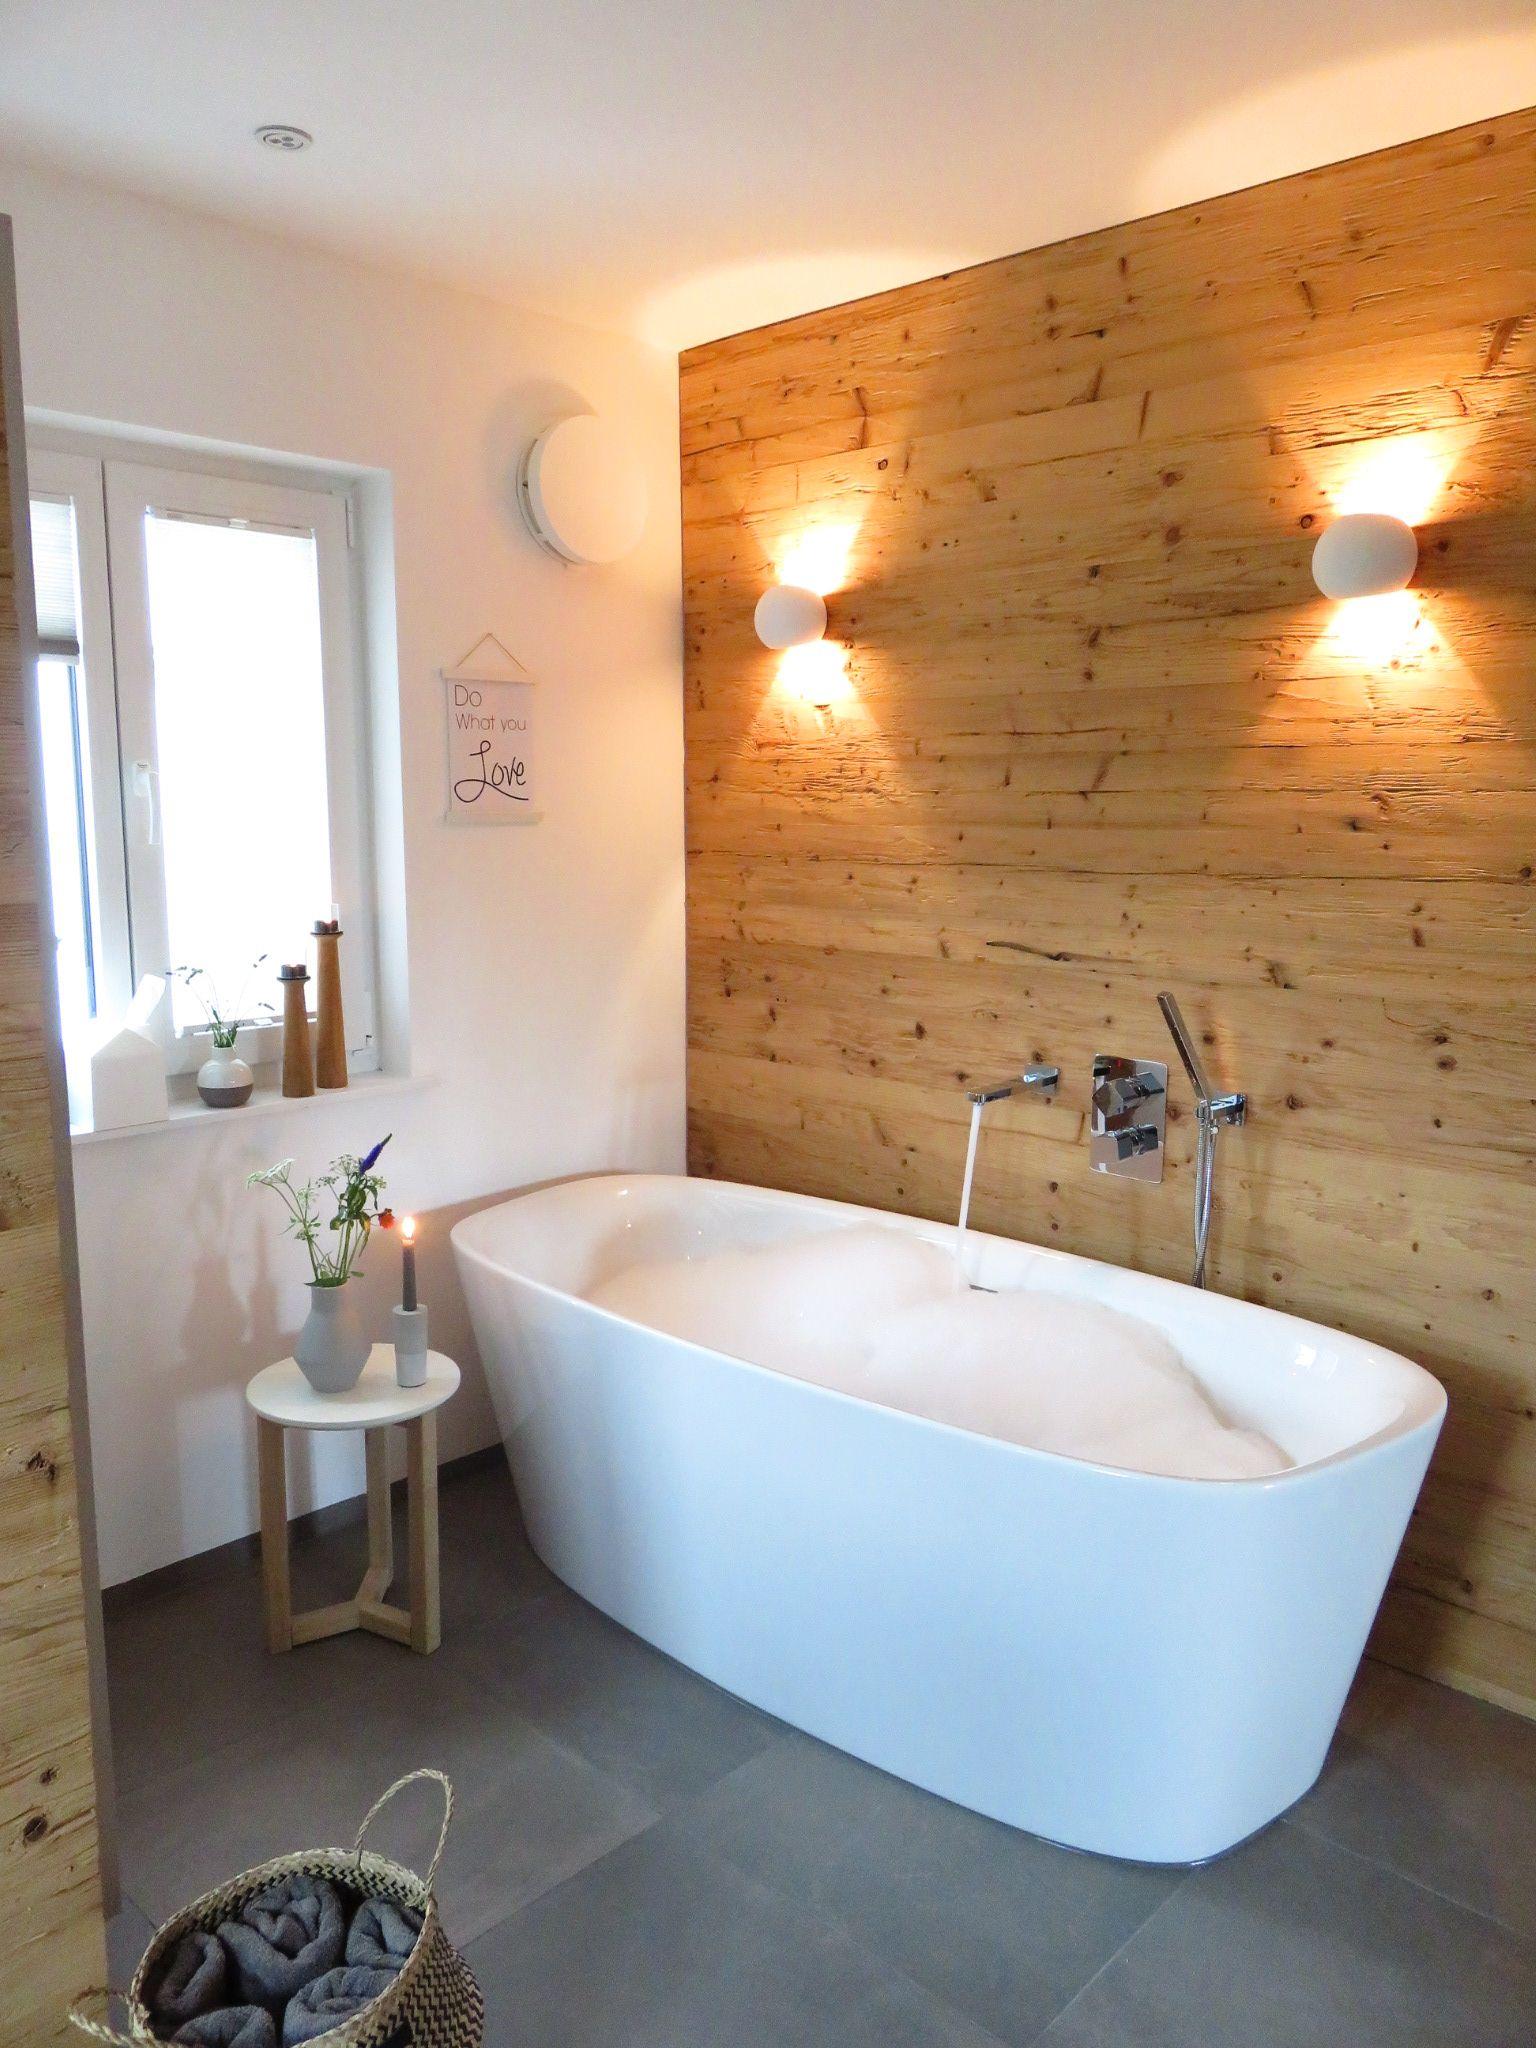 badezimmer  badezimmer innenausstattung badezimmer